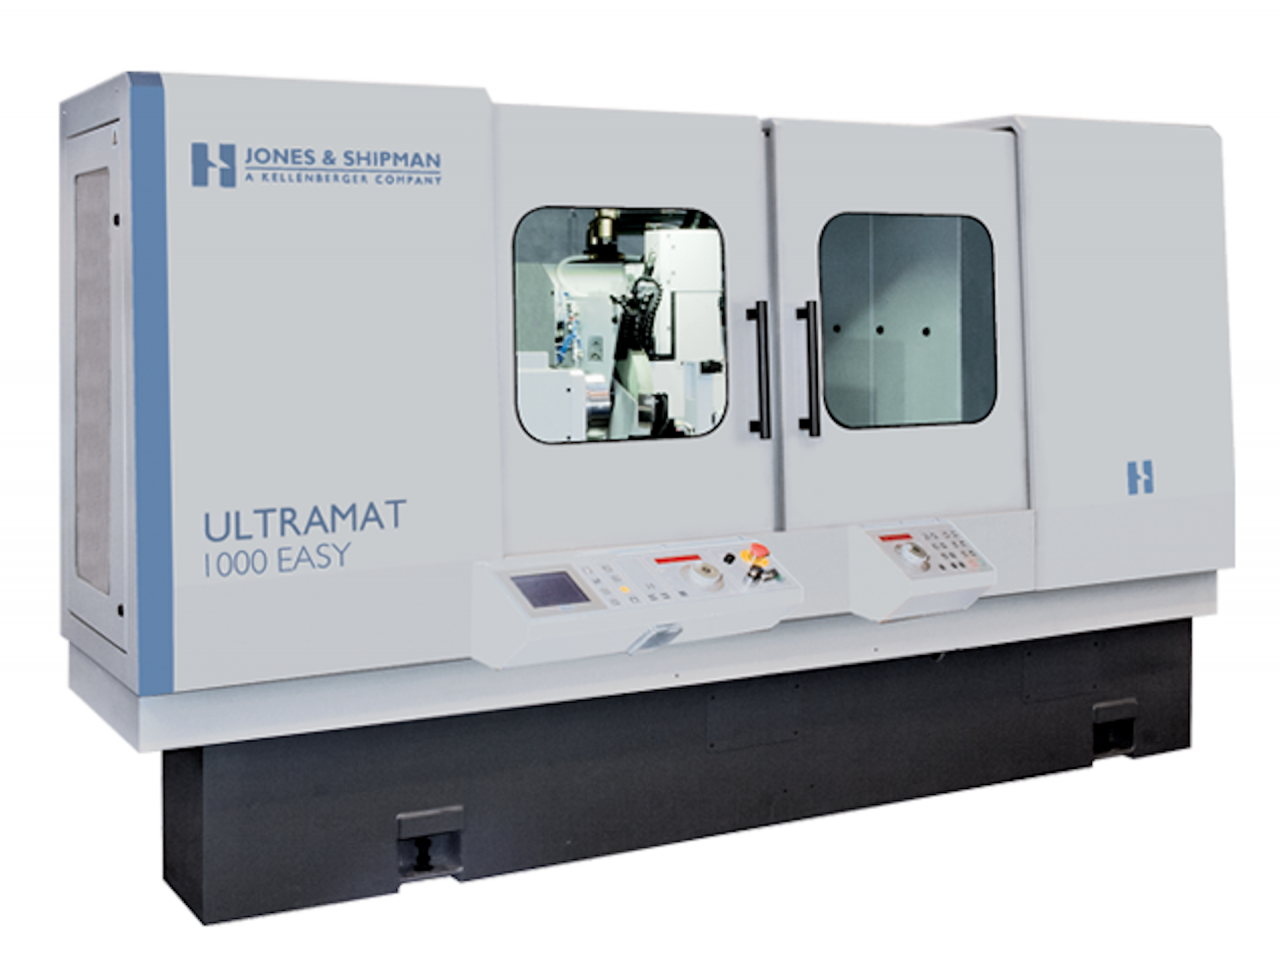 Jones-and-shipman-Ultramat-650-1280x975.png